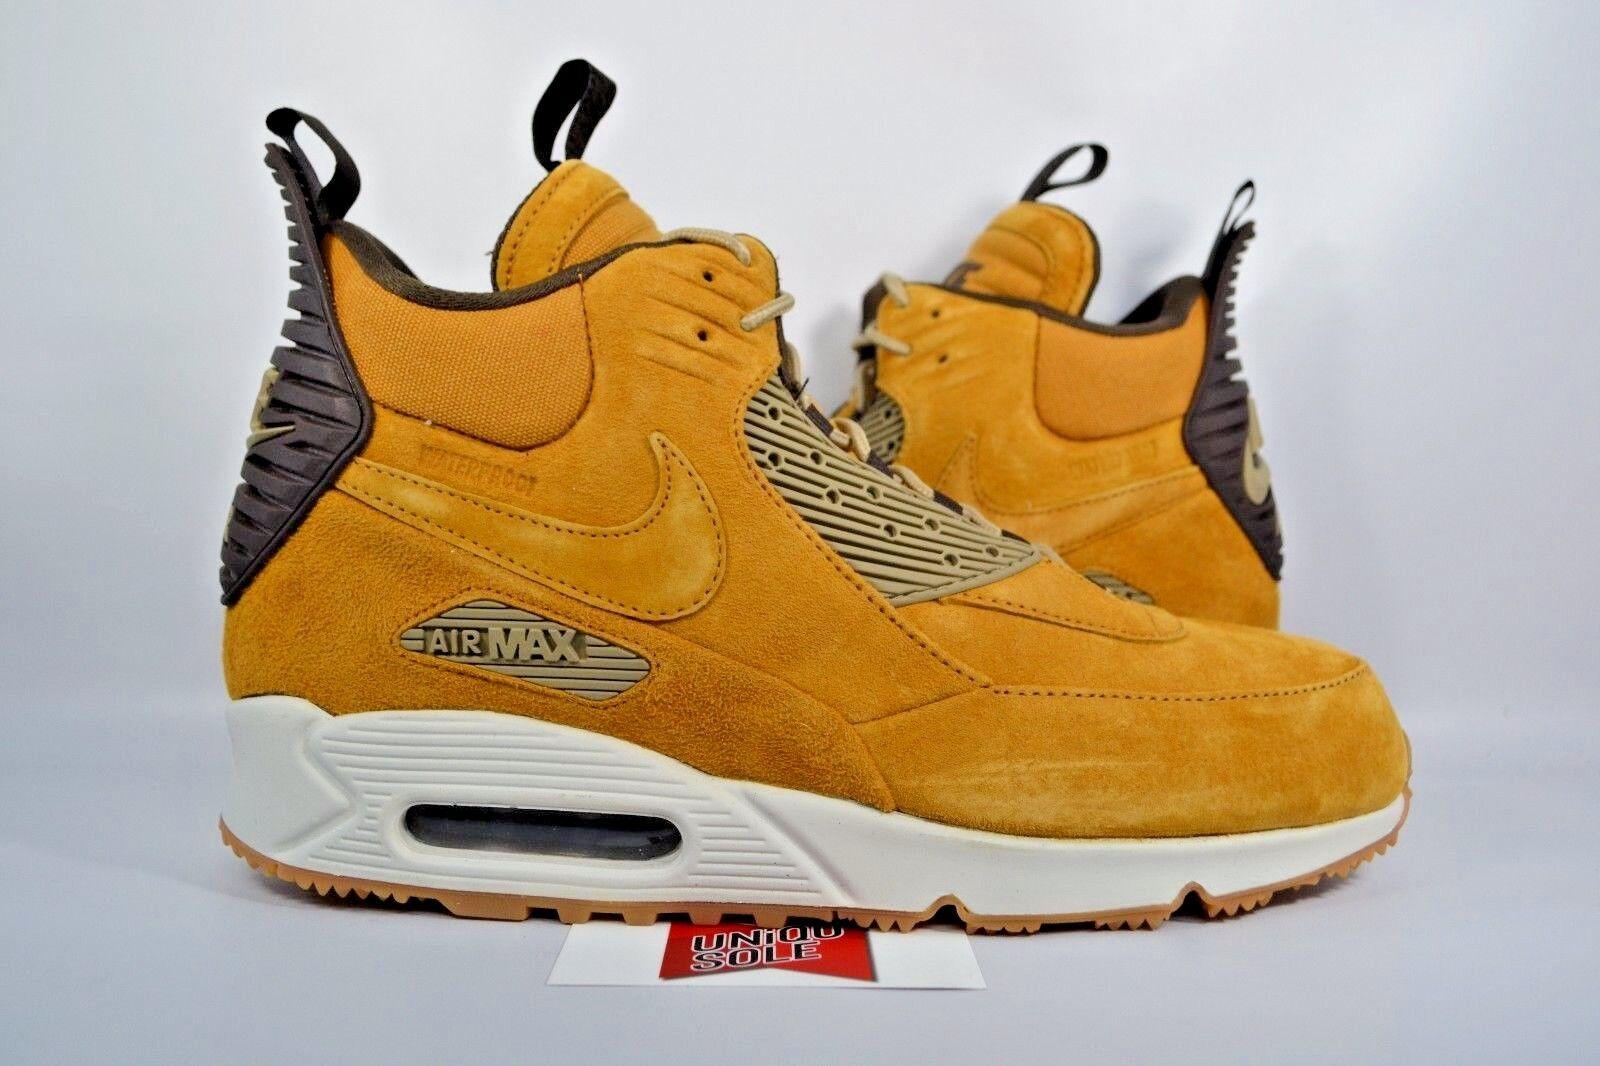 NEW Nike Air Max 90 Sneakerboot WHEAT FLAX HAYSTACK 684714-700 sz 9 WINTER BOOT